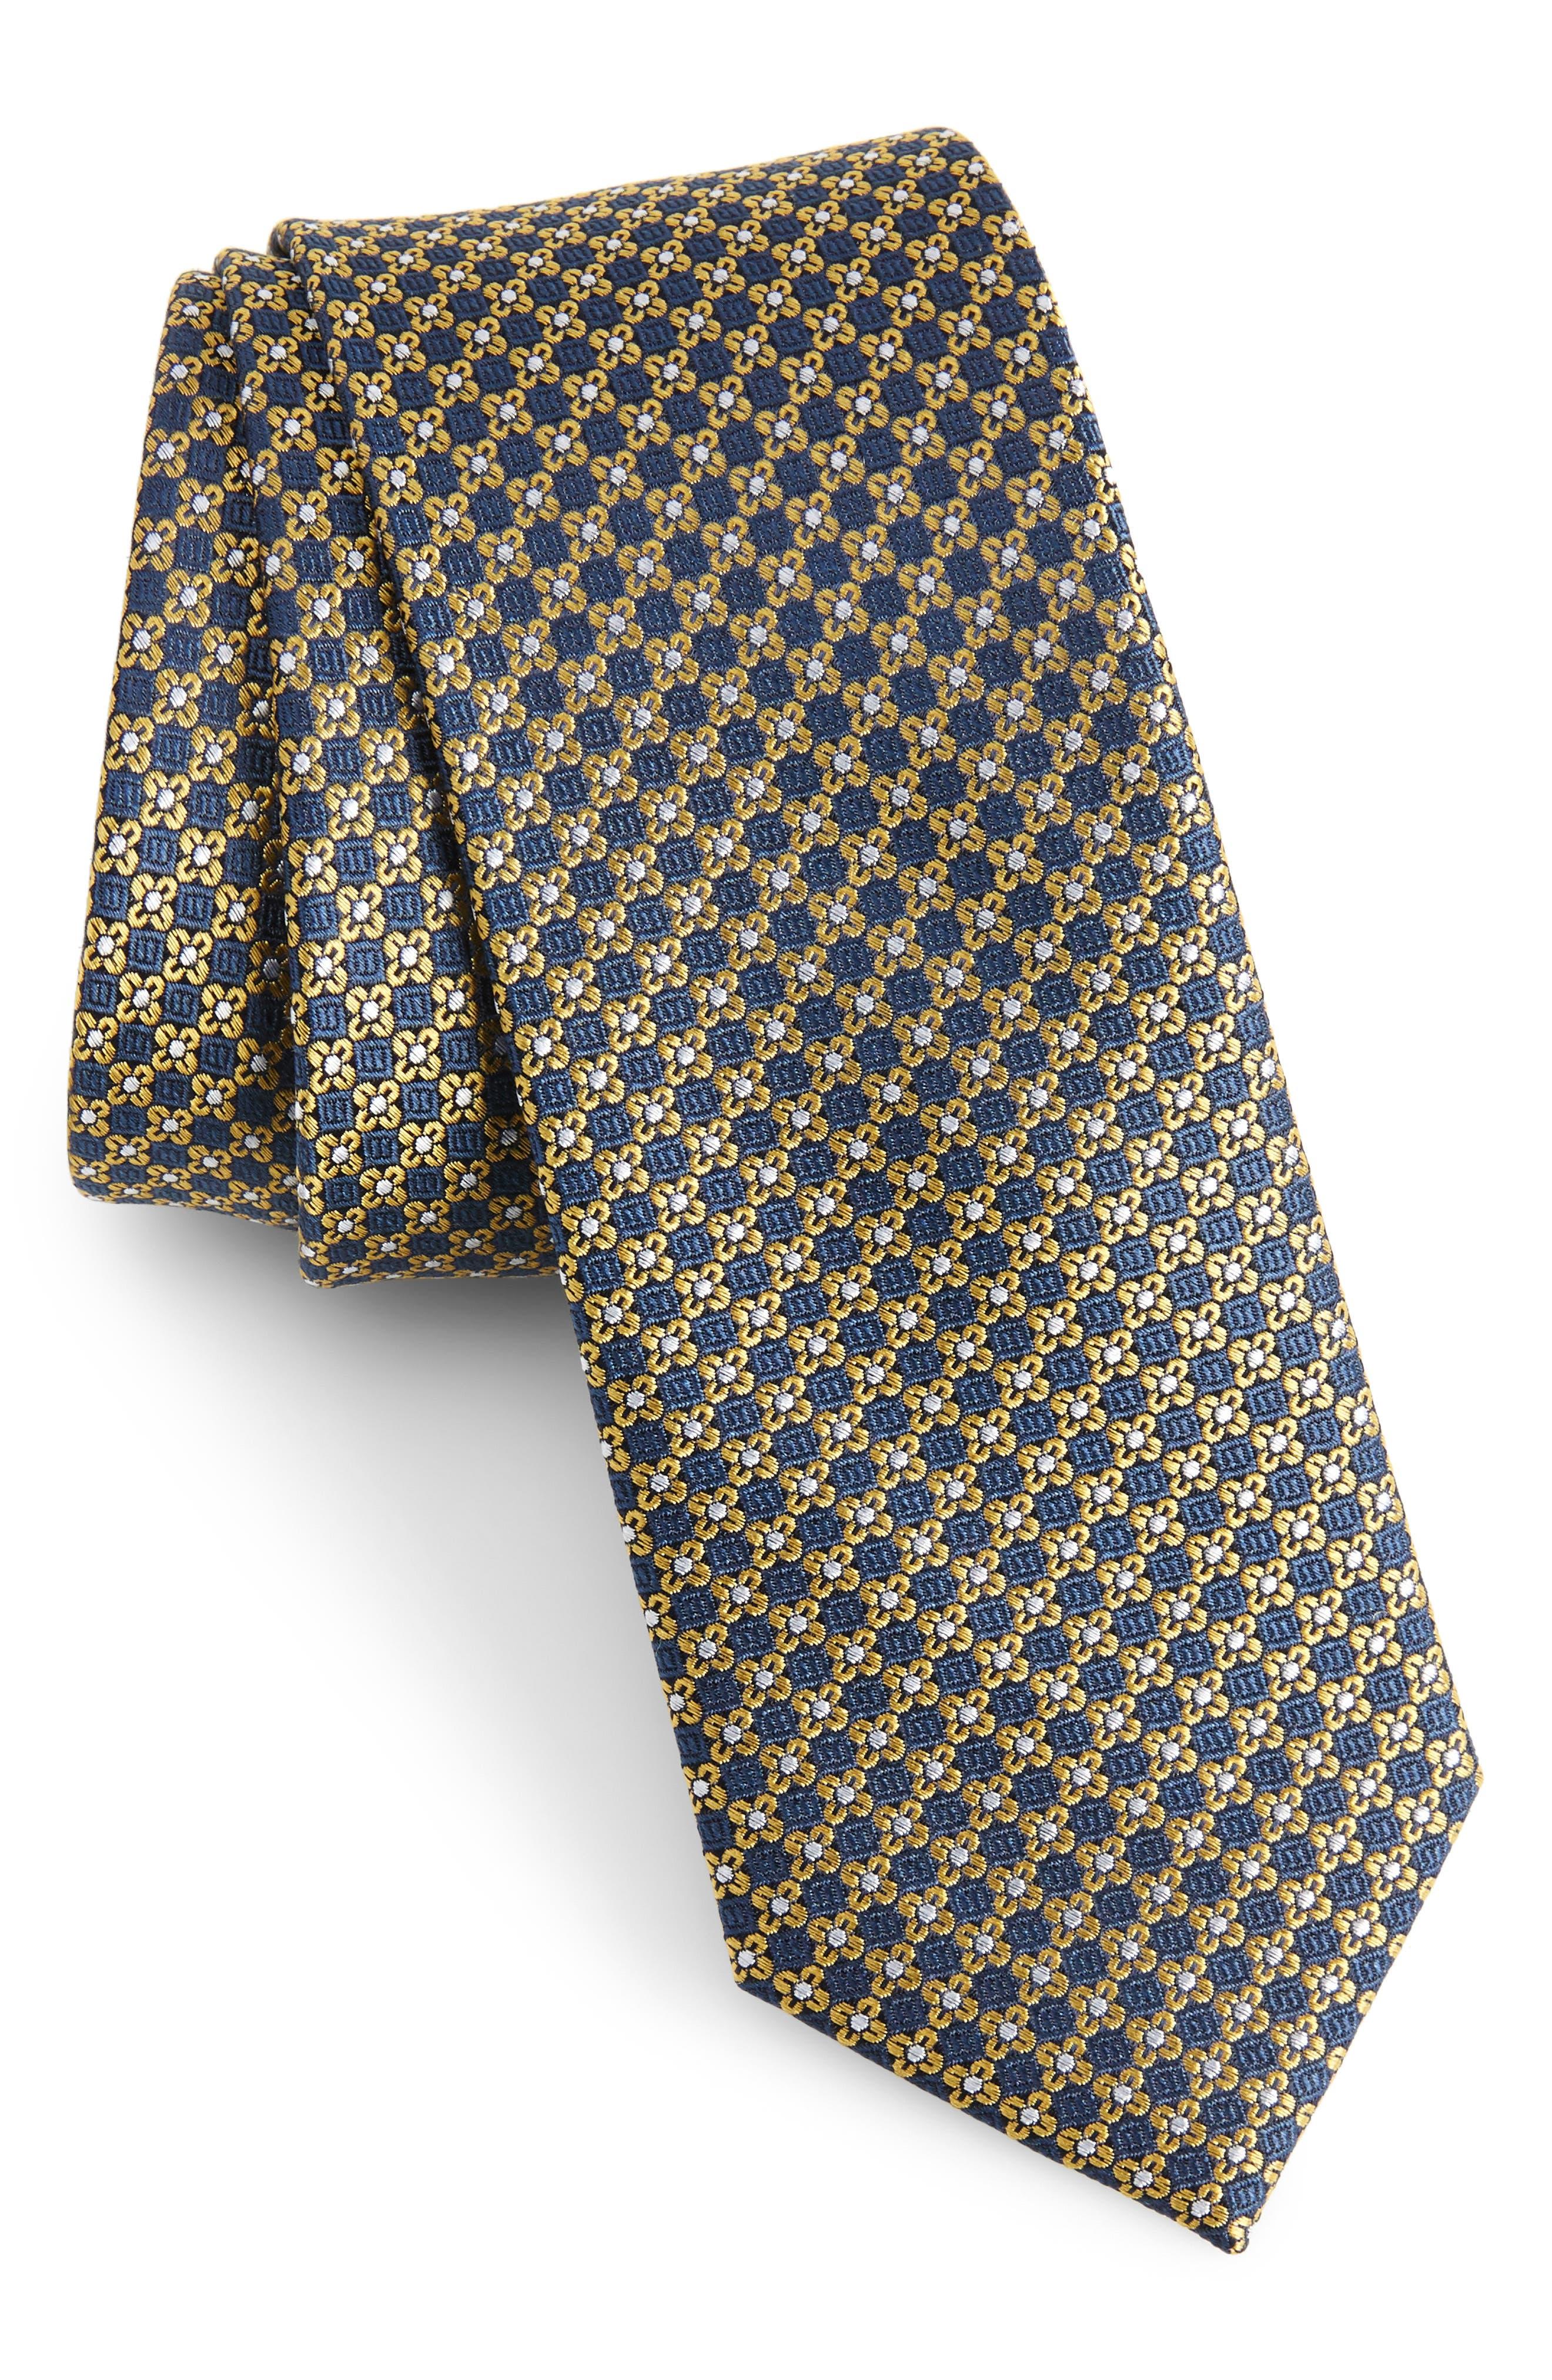 Alternate Image 1 Selected - The Tie Bar Floral Network Silk Skinny Tie